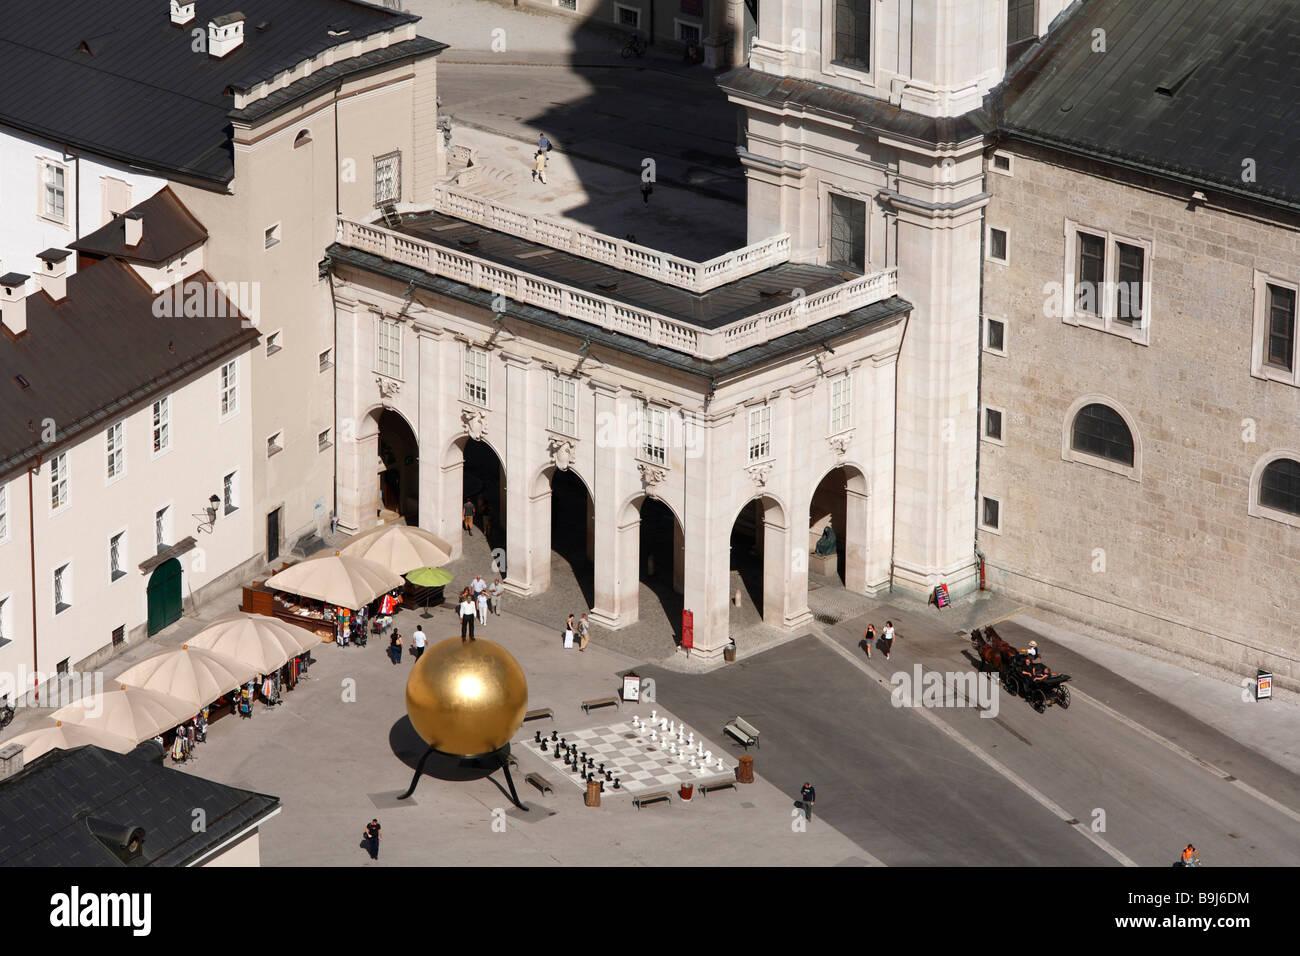 Kapitelplatz with the art object 'Sphaera' by Stephan Balkenhol, Salzburg, Austria, Europe - Stock Image